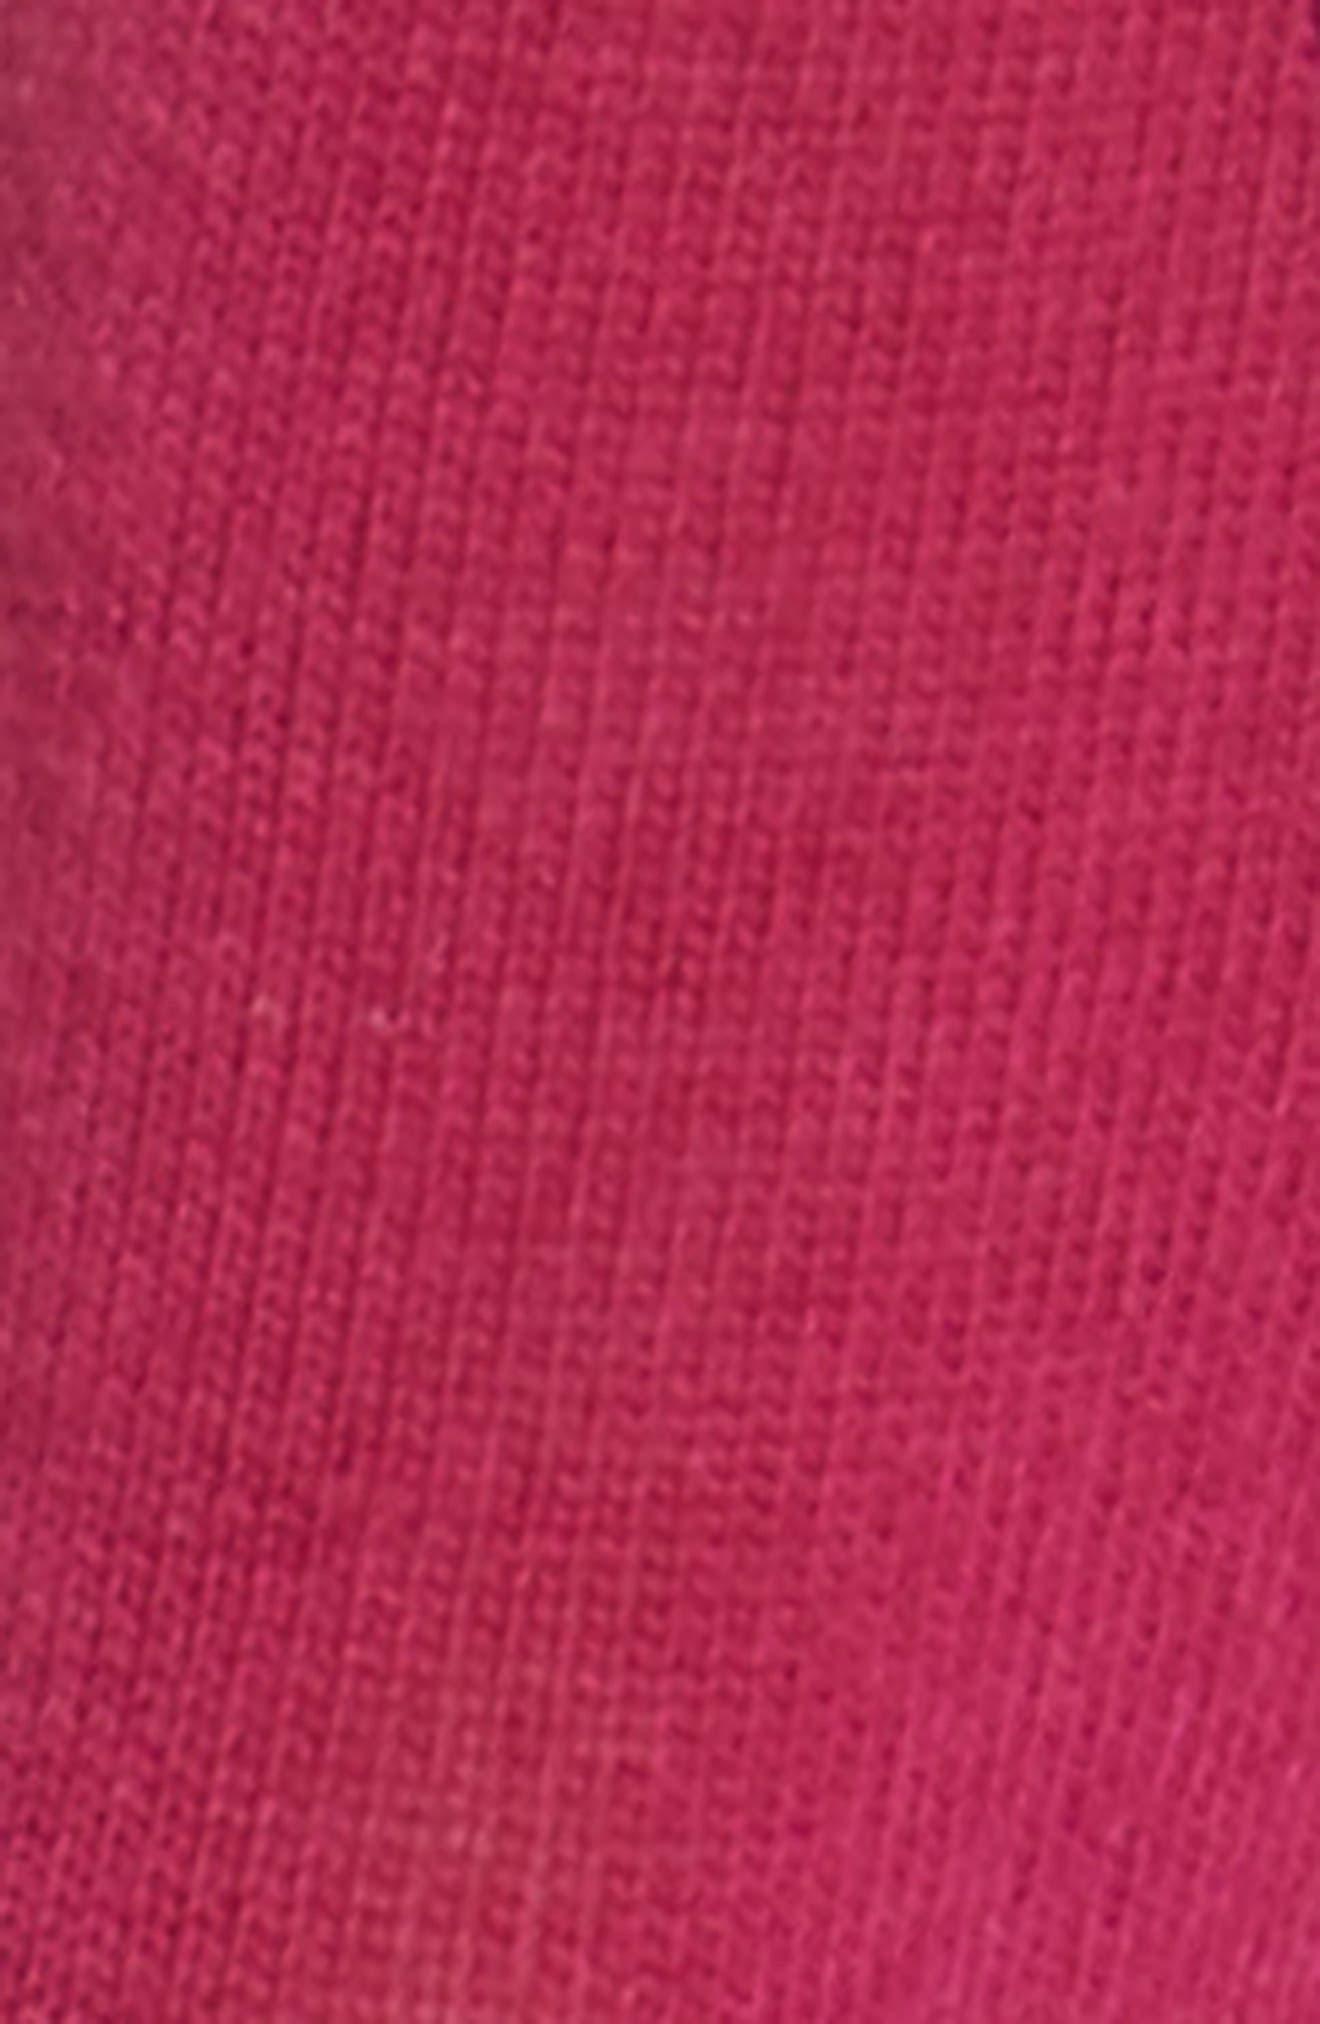 Hide & Seek No-Show Socks,                             Alternate thumbnail 2, color,                             660